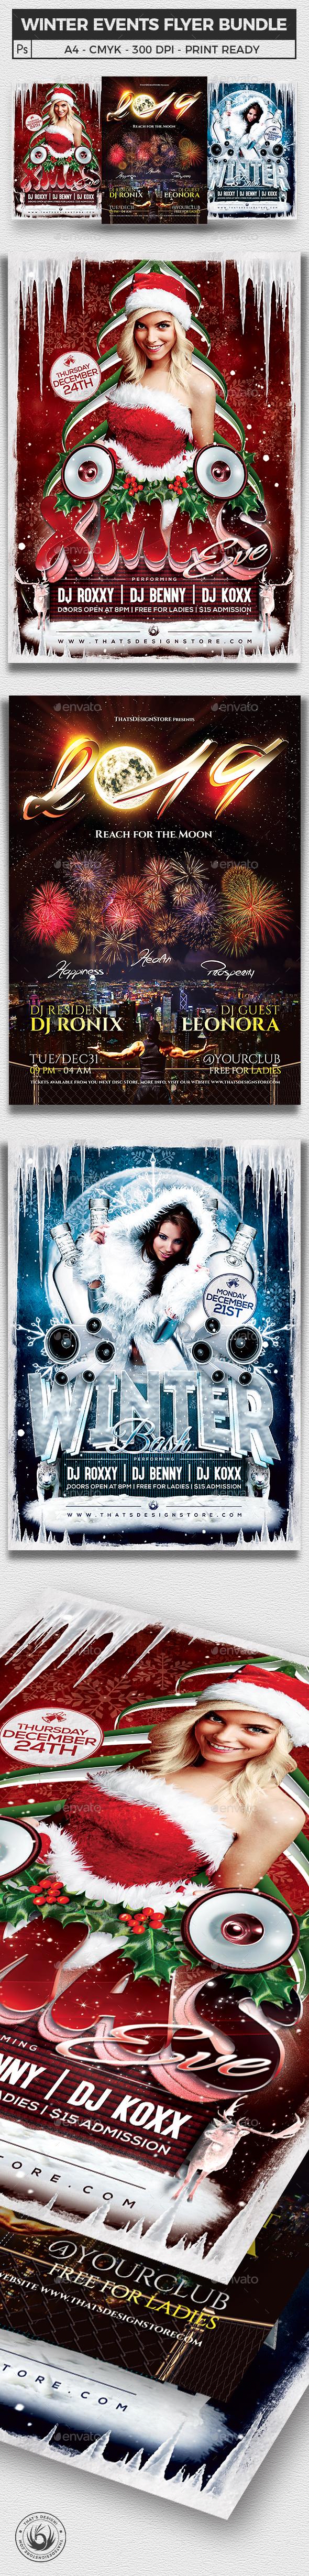 Winter Events Flyer Bundle V1 - Clubs & Parties Events